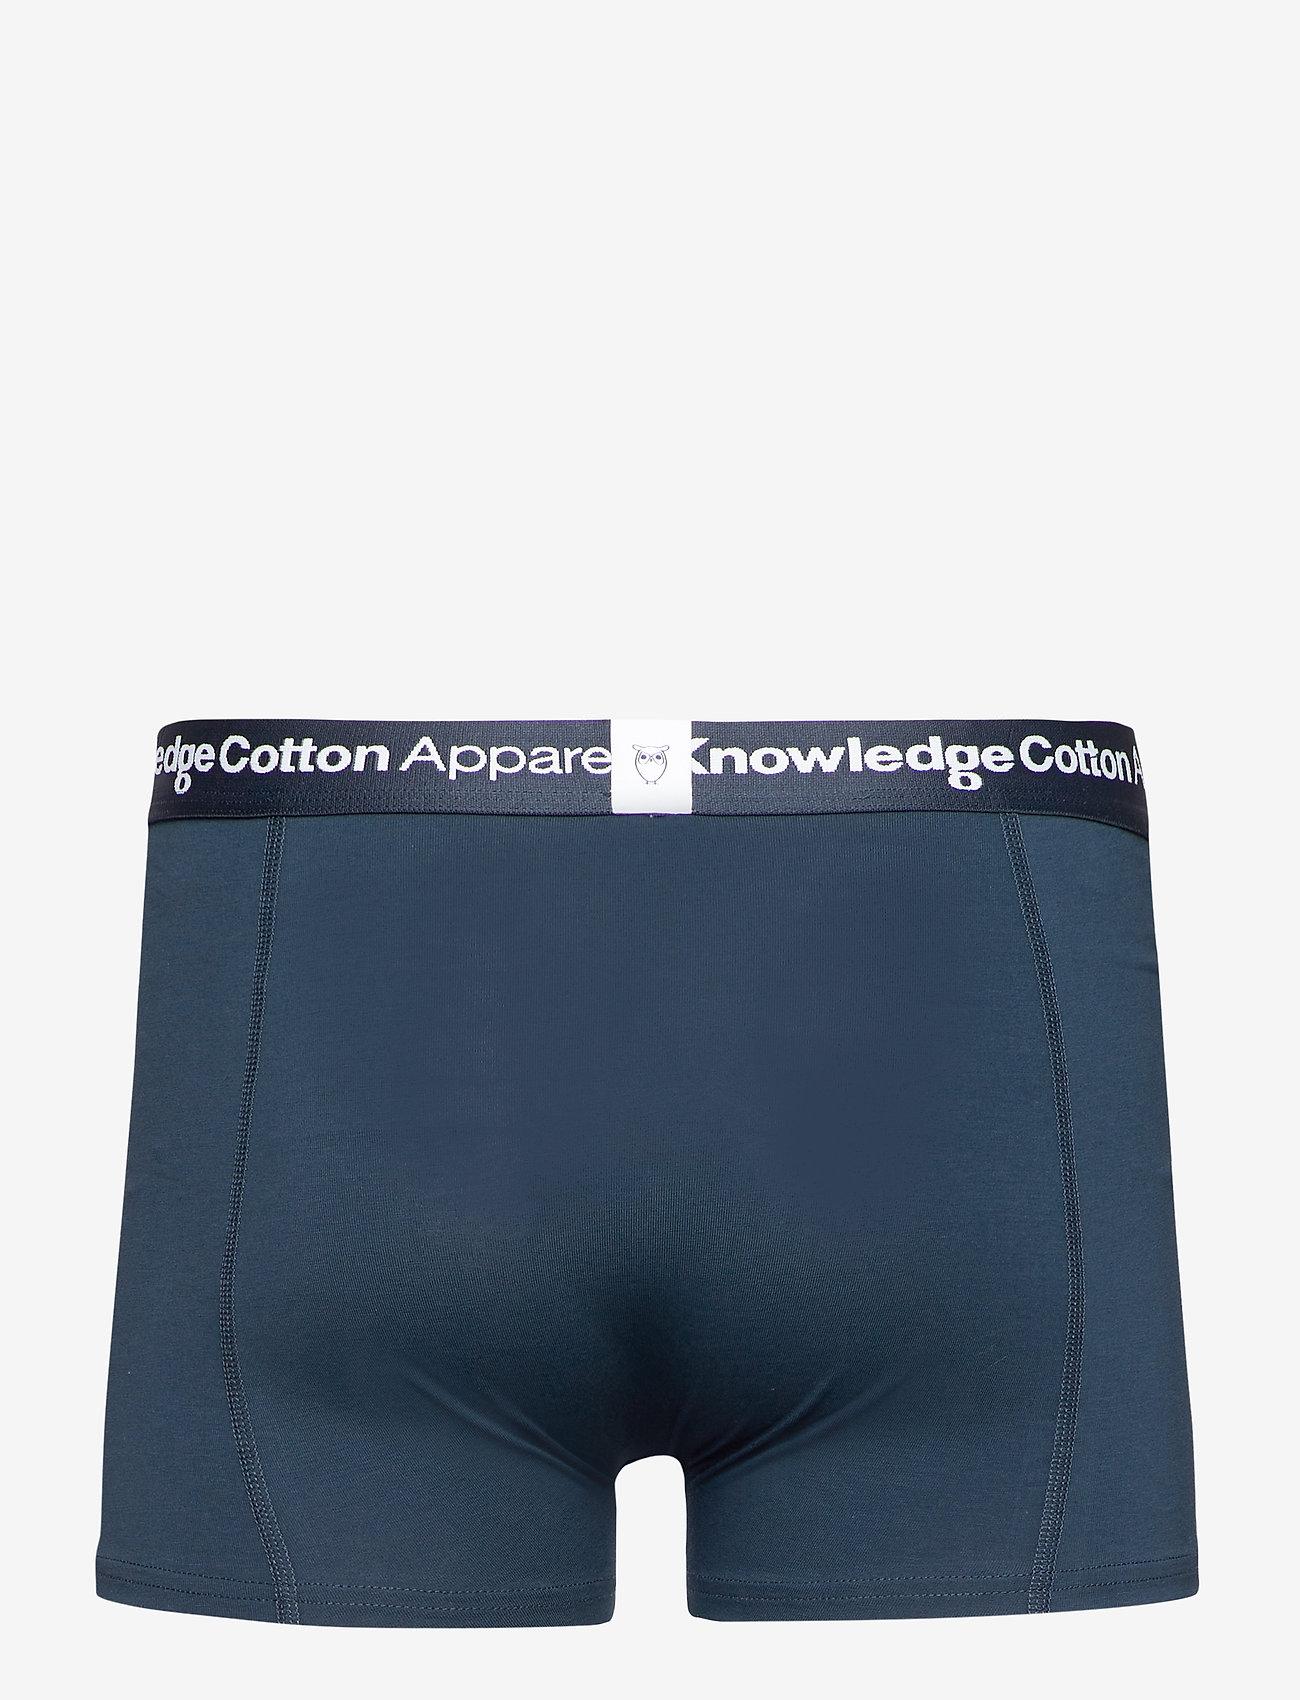 Knowledge Cotton Apparel - MAPLE 2-pack underwear - GOTS/Vegan - caleçon - grey melange - 1